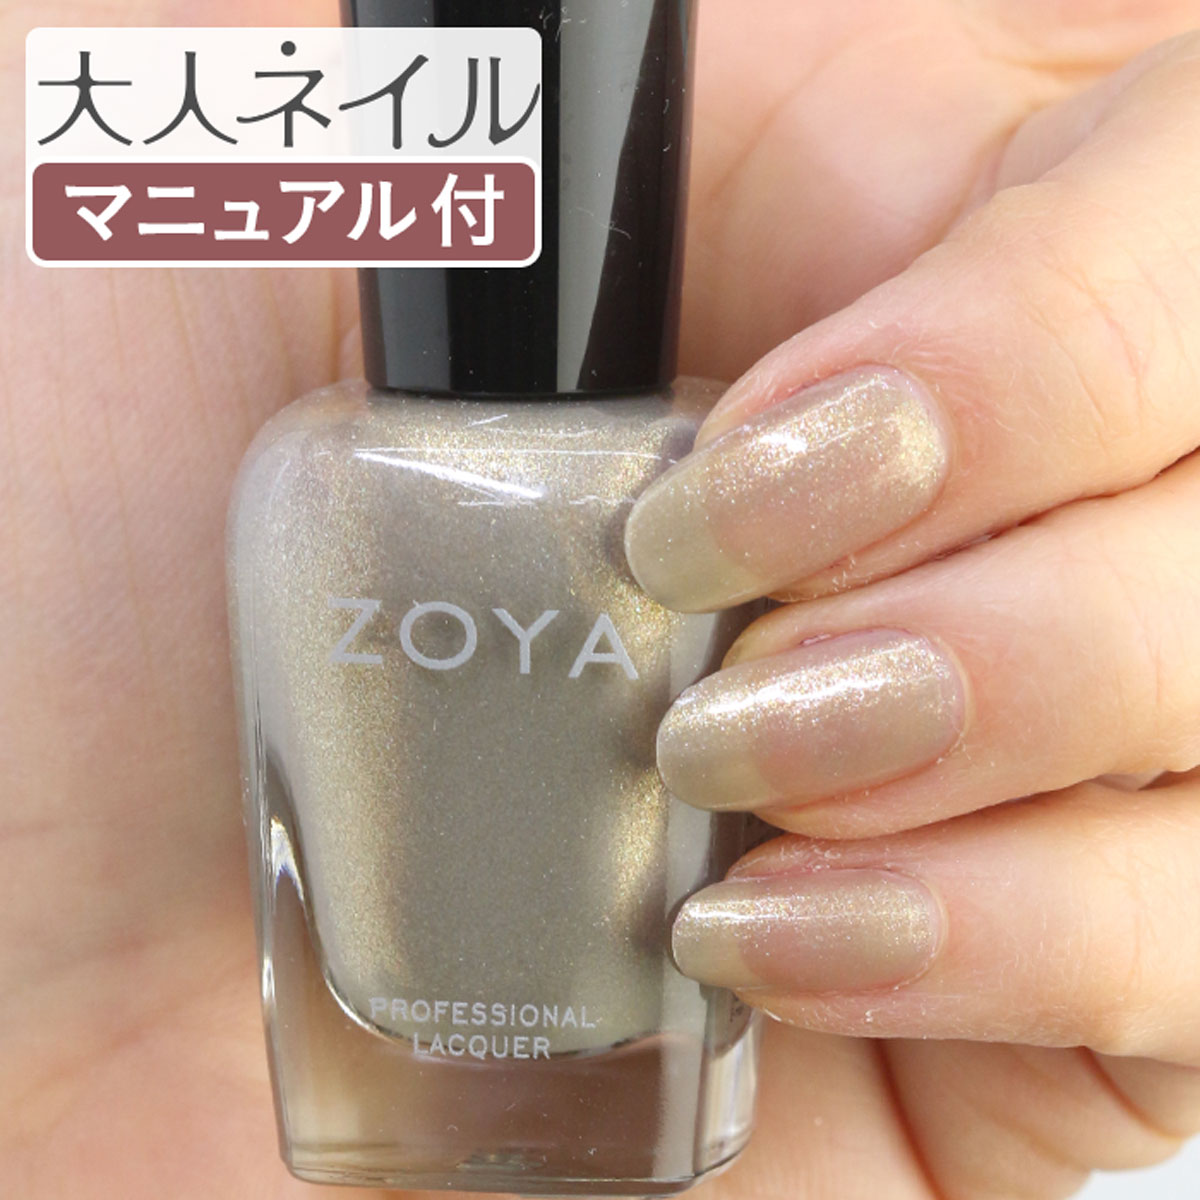 ZOYA ゾーヤ ゾヤ ネイルカラー ZP538 15mL JULES ジュール 自爪 の為に作られた ネイル にやさしい 自然派 マニキュア zoya セルフネイル にもおすすめ パール ゴールド